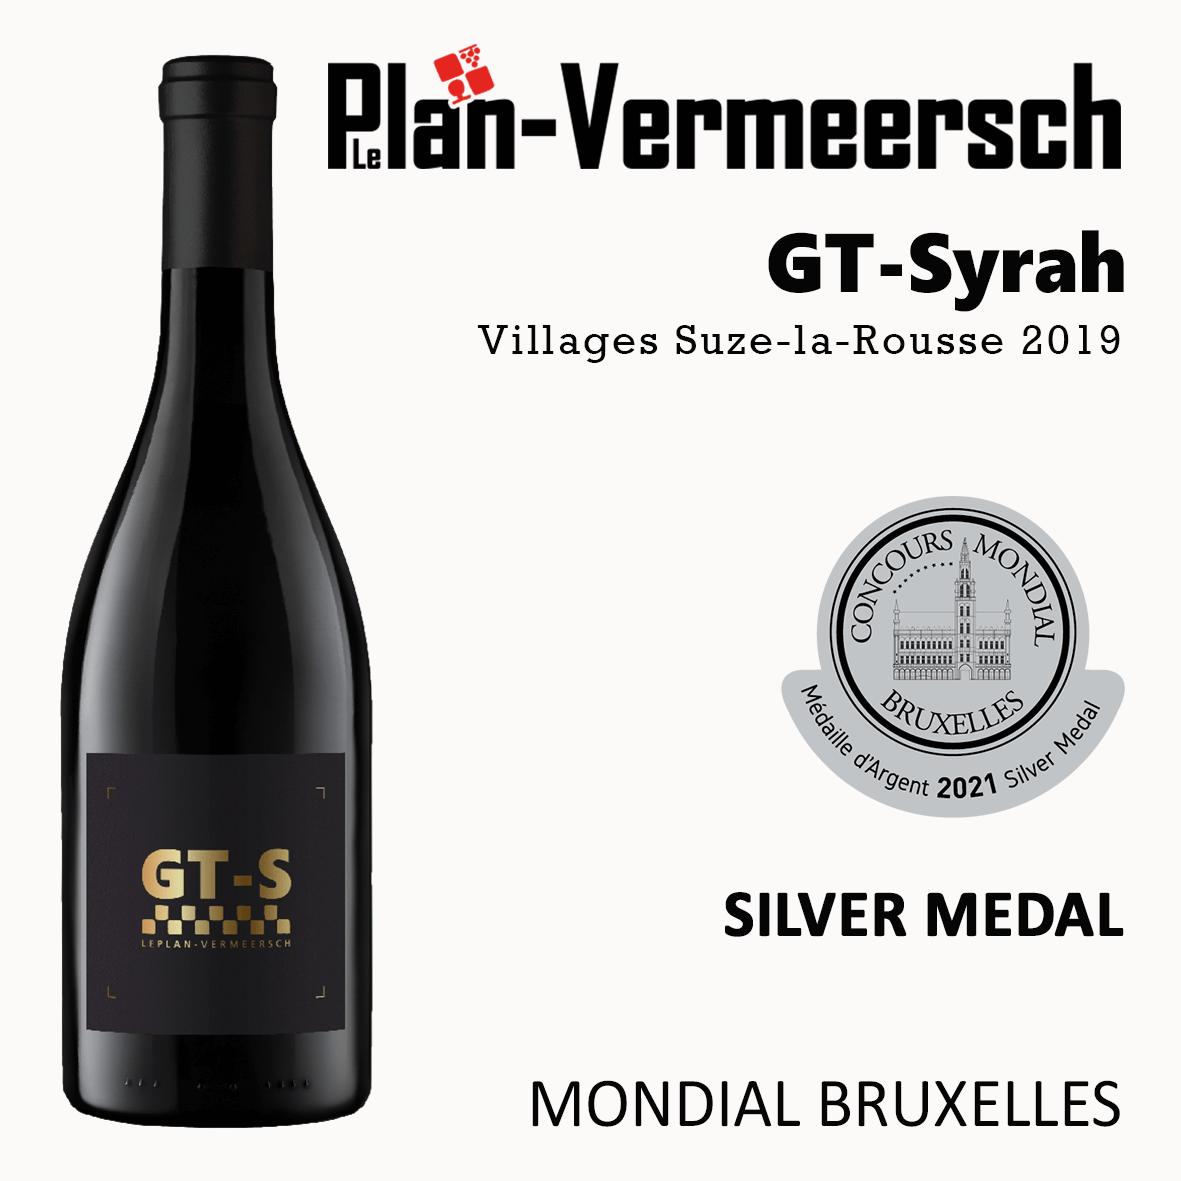 Bottle of GT-Syrah wine silver medal mondial Bruxelles LePlan-Vermeersch